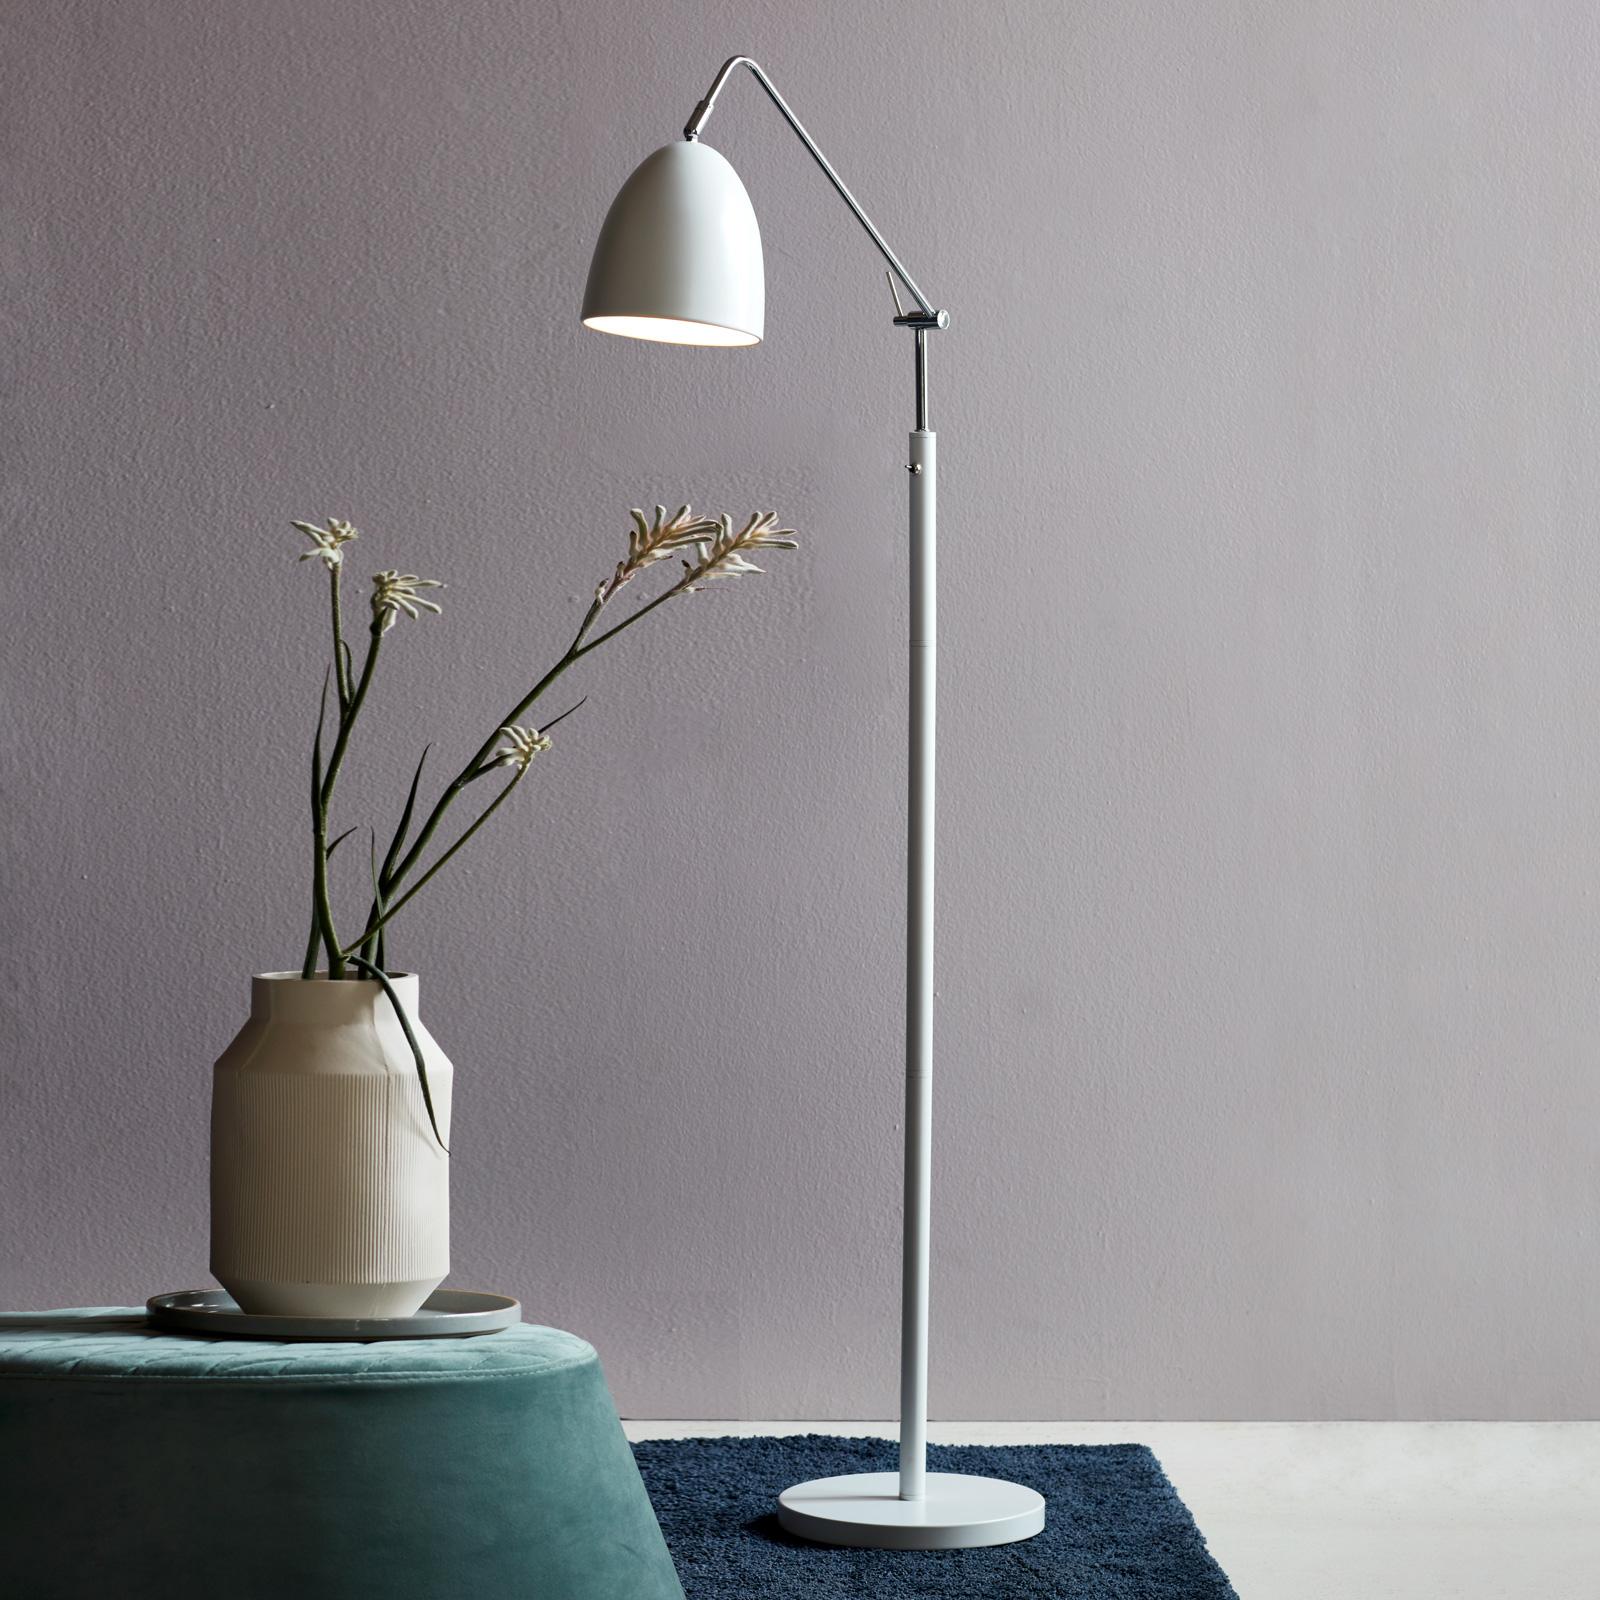 Vloerlamp Alexander in delicate vorm, wit